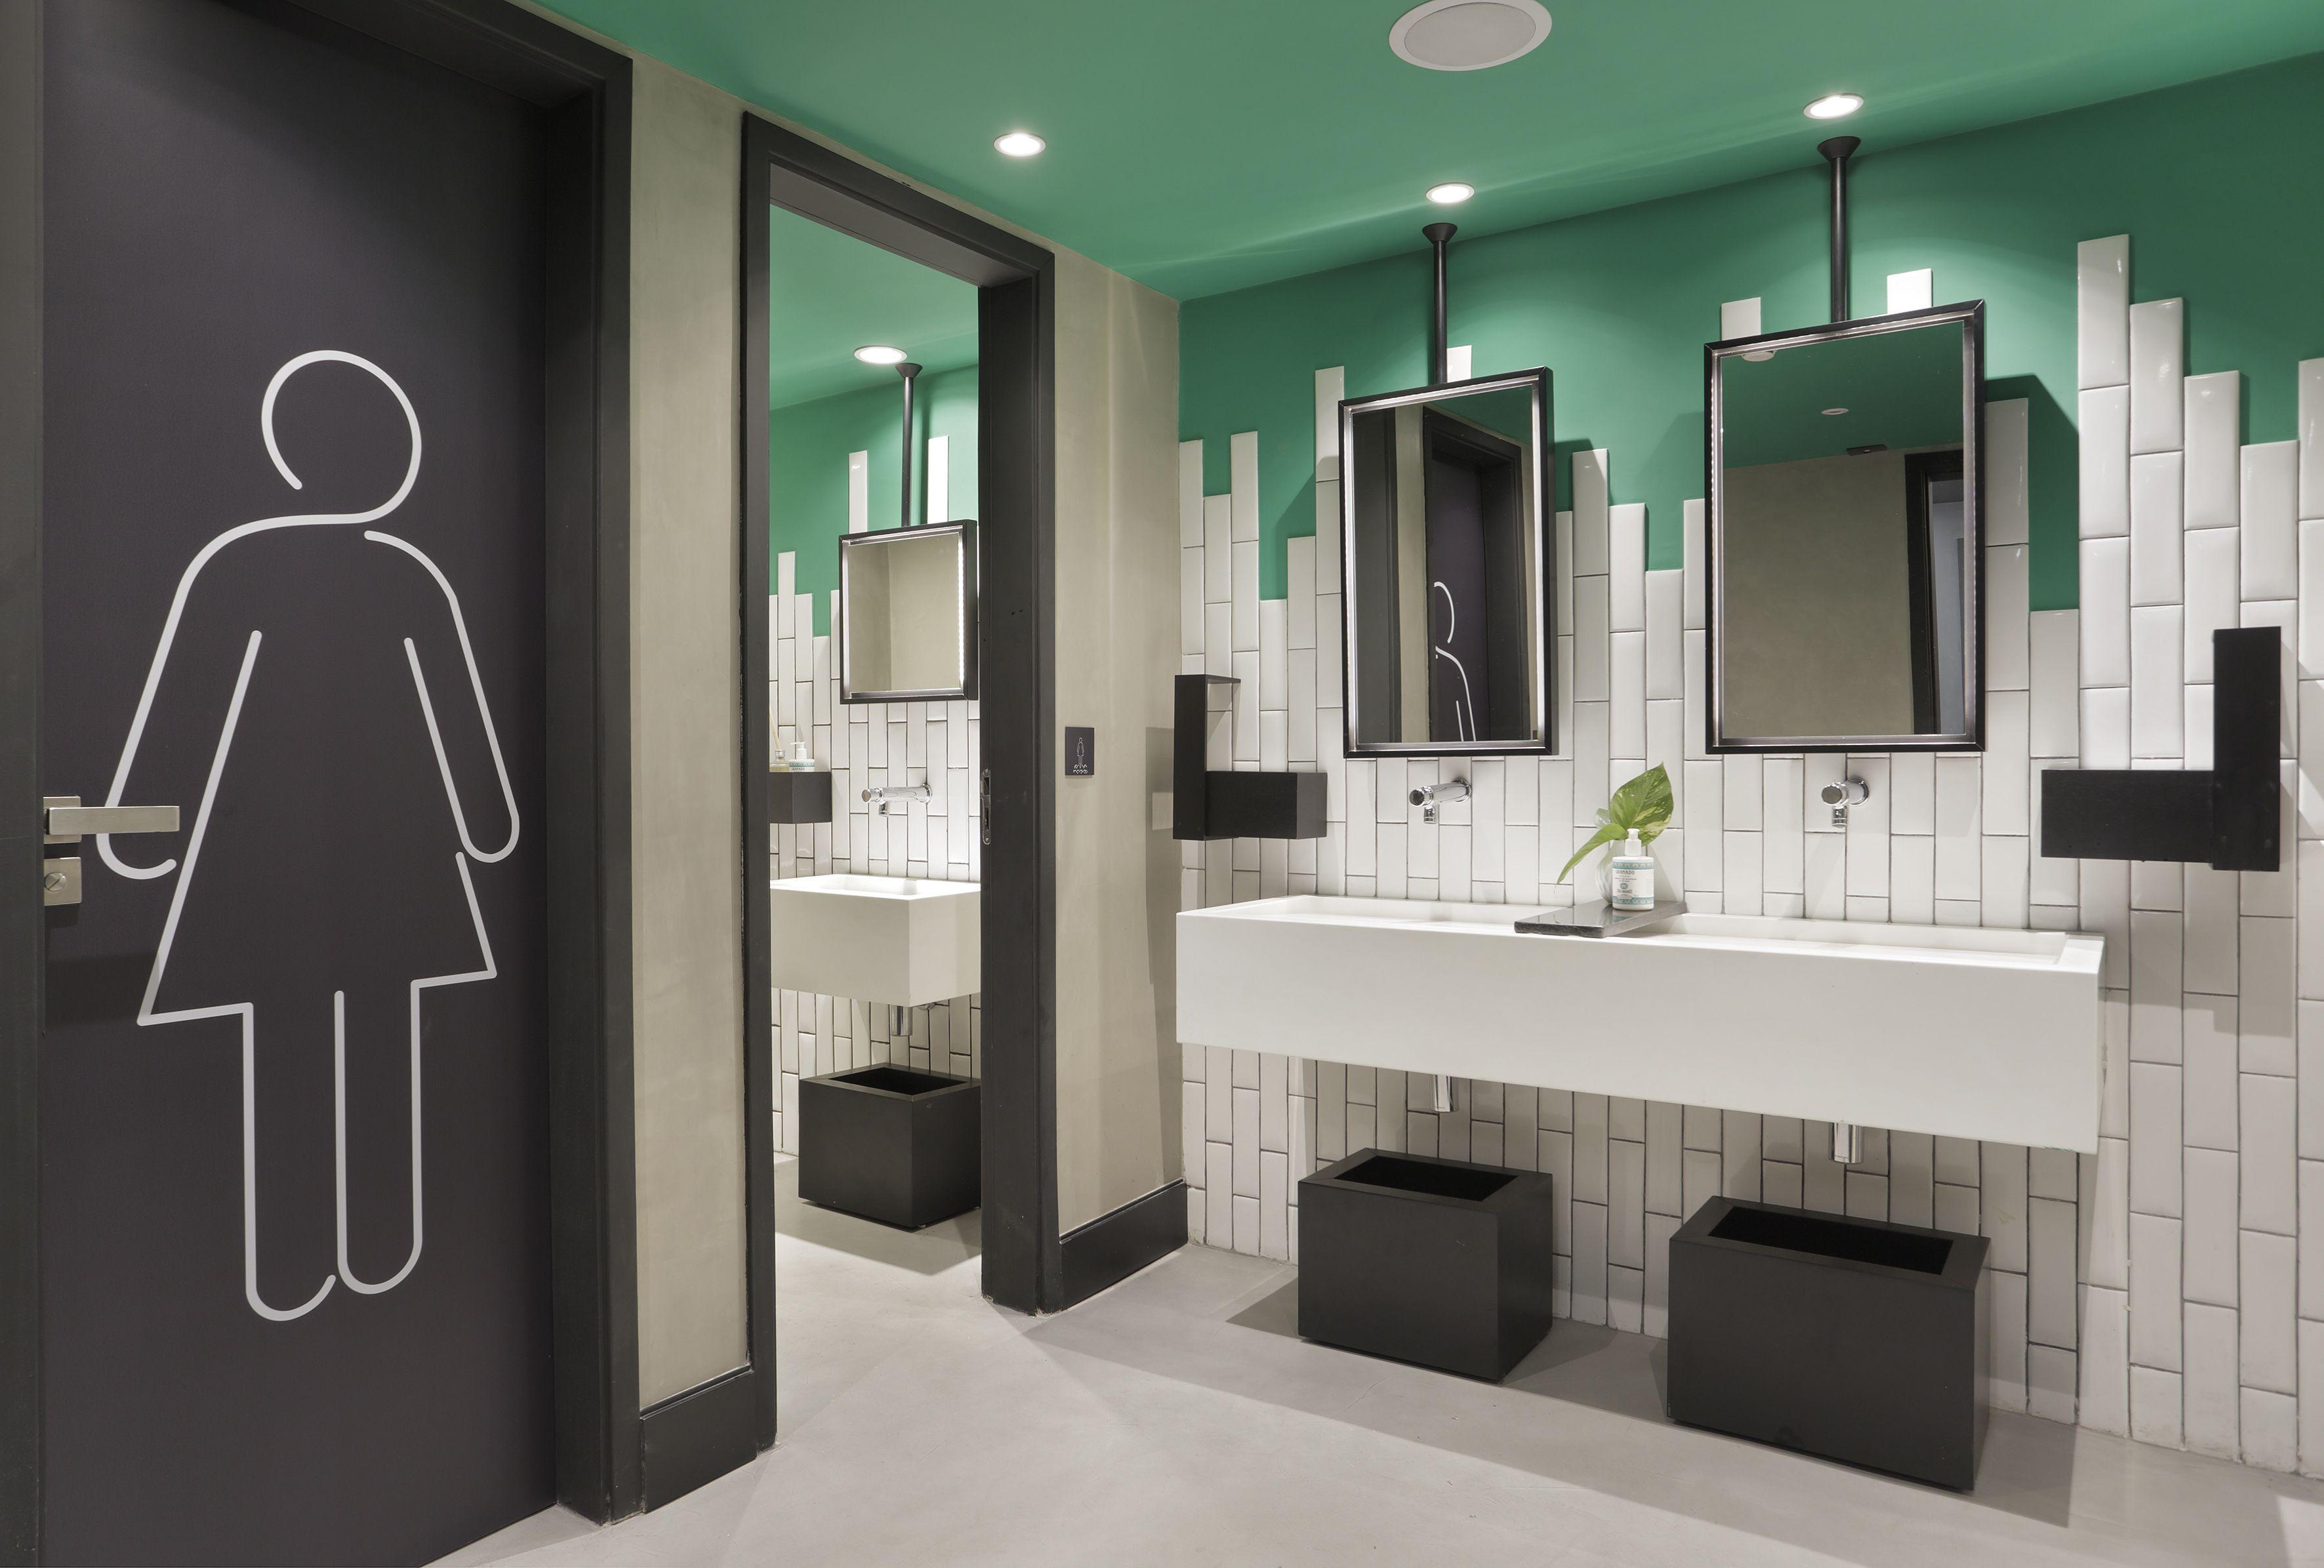 Pin von Melina Romano Interiores auf Hotel Yoo2 RJ | Pinterest ...